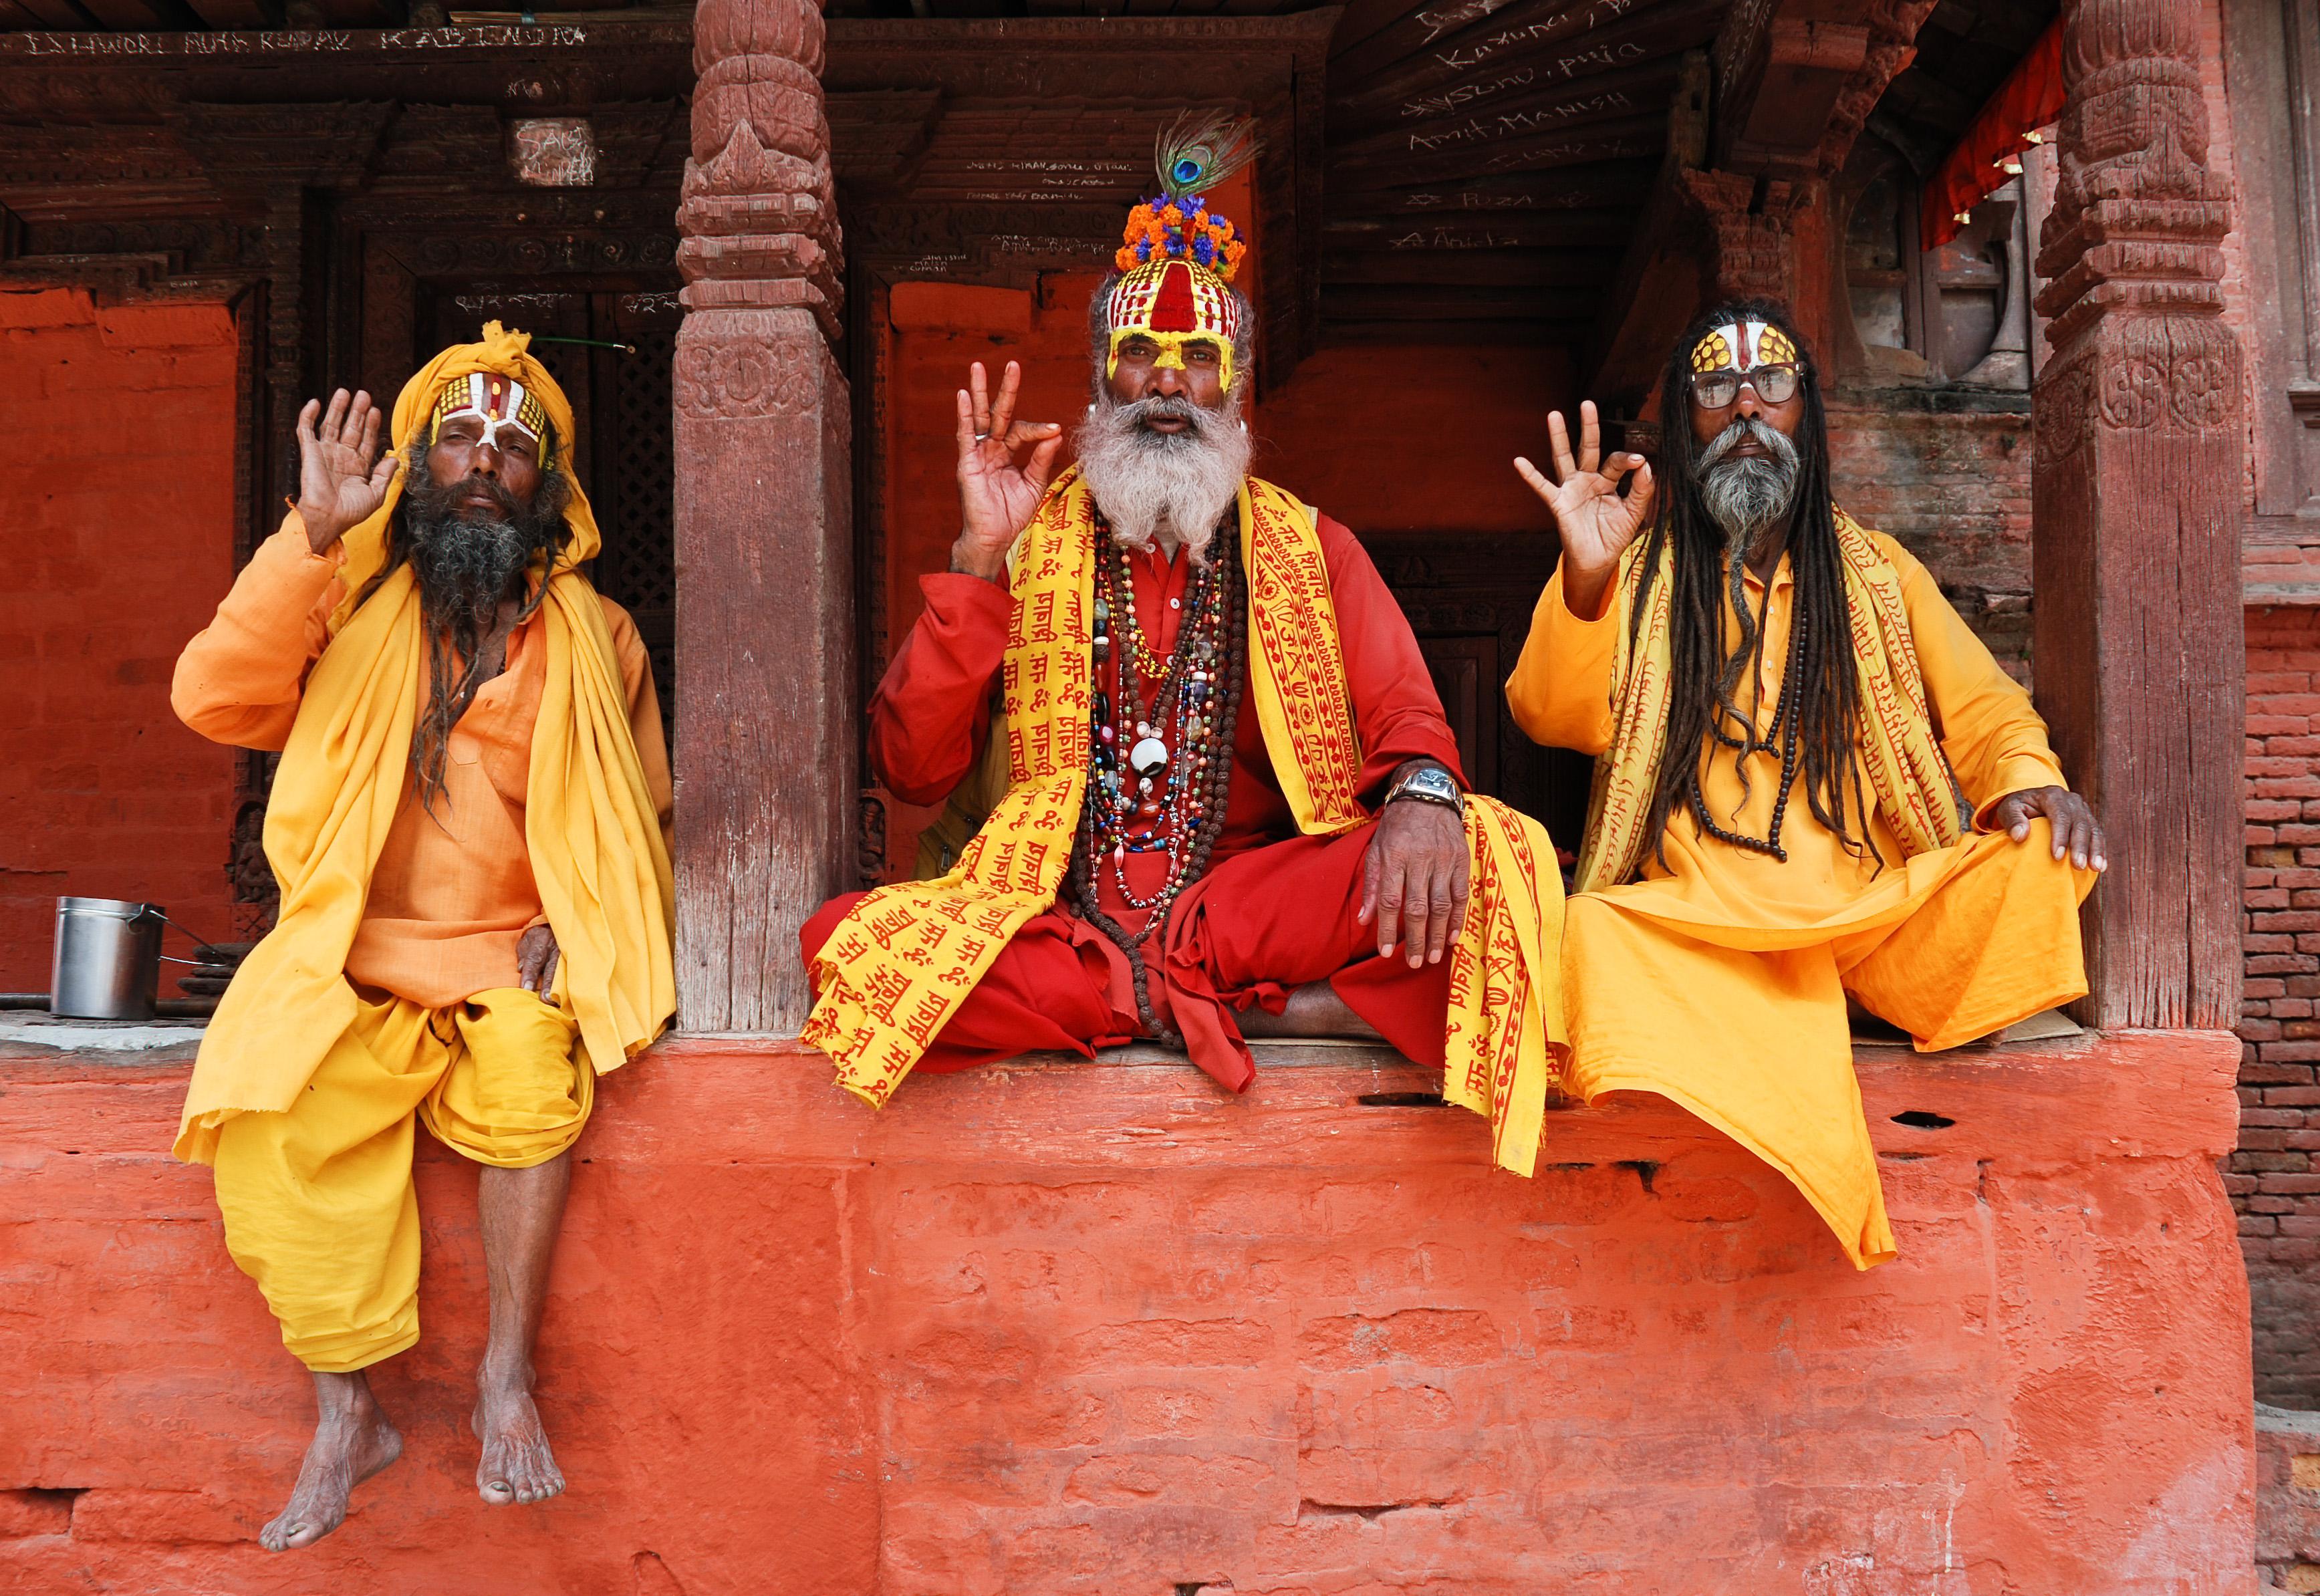 https://upload.wikimedia.org/wikipedia/commons/c/ce/Three_saddhus_at_Kathmandu_Durbar_Square.jpg